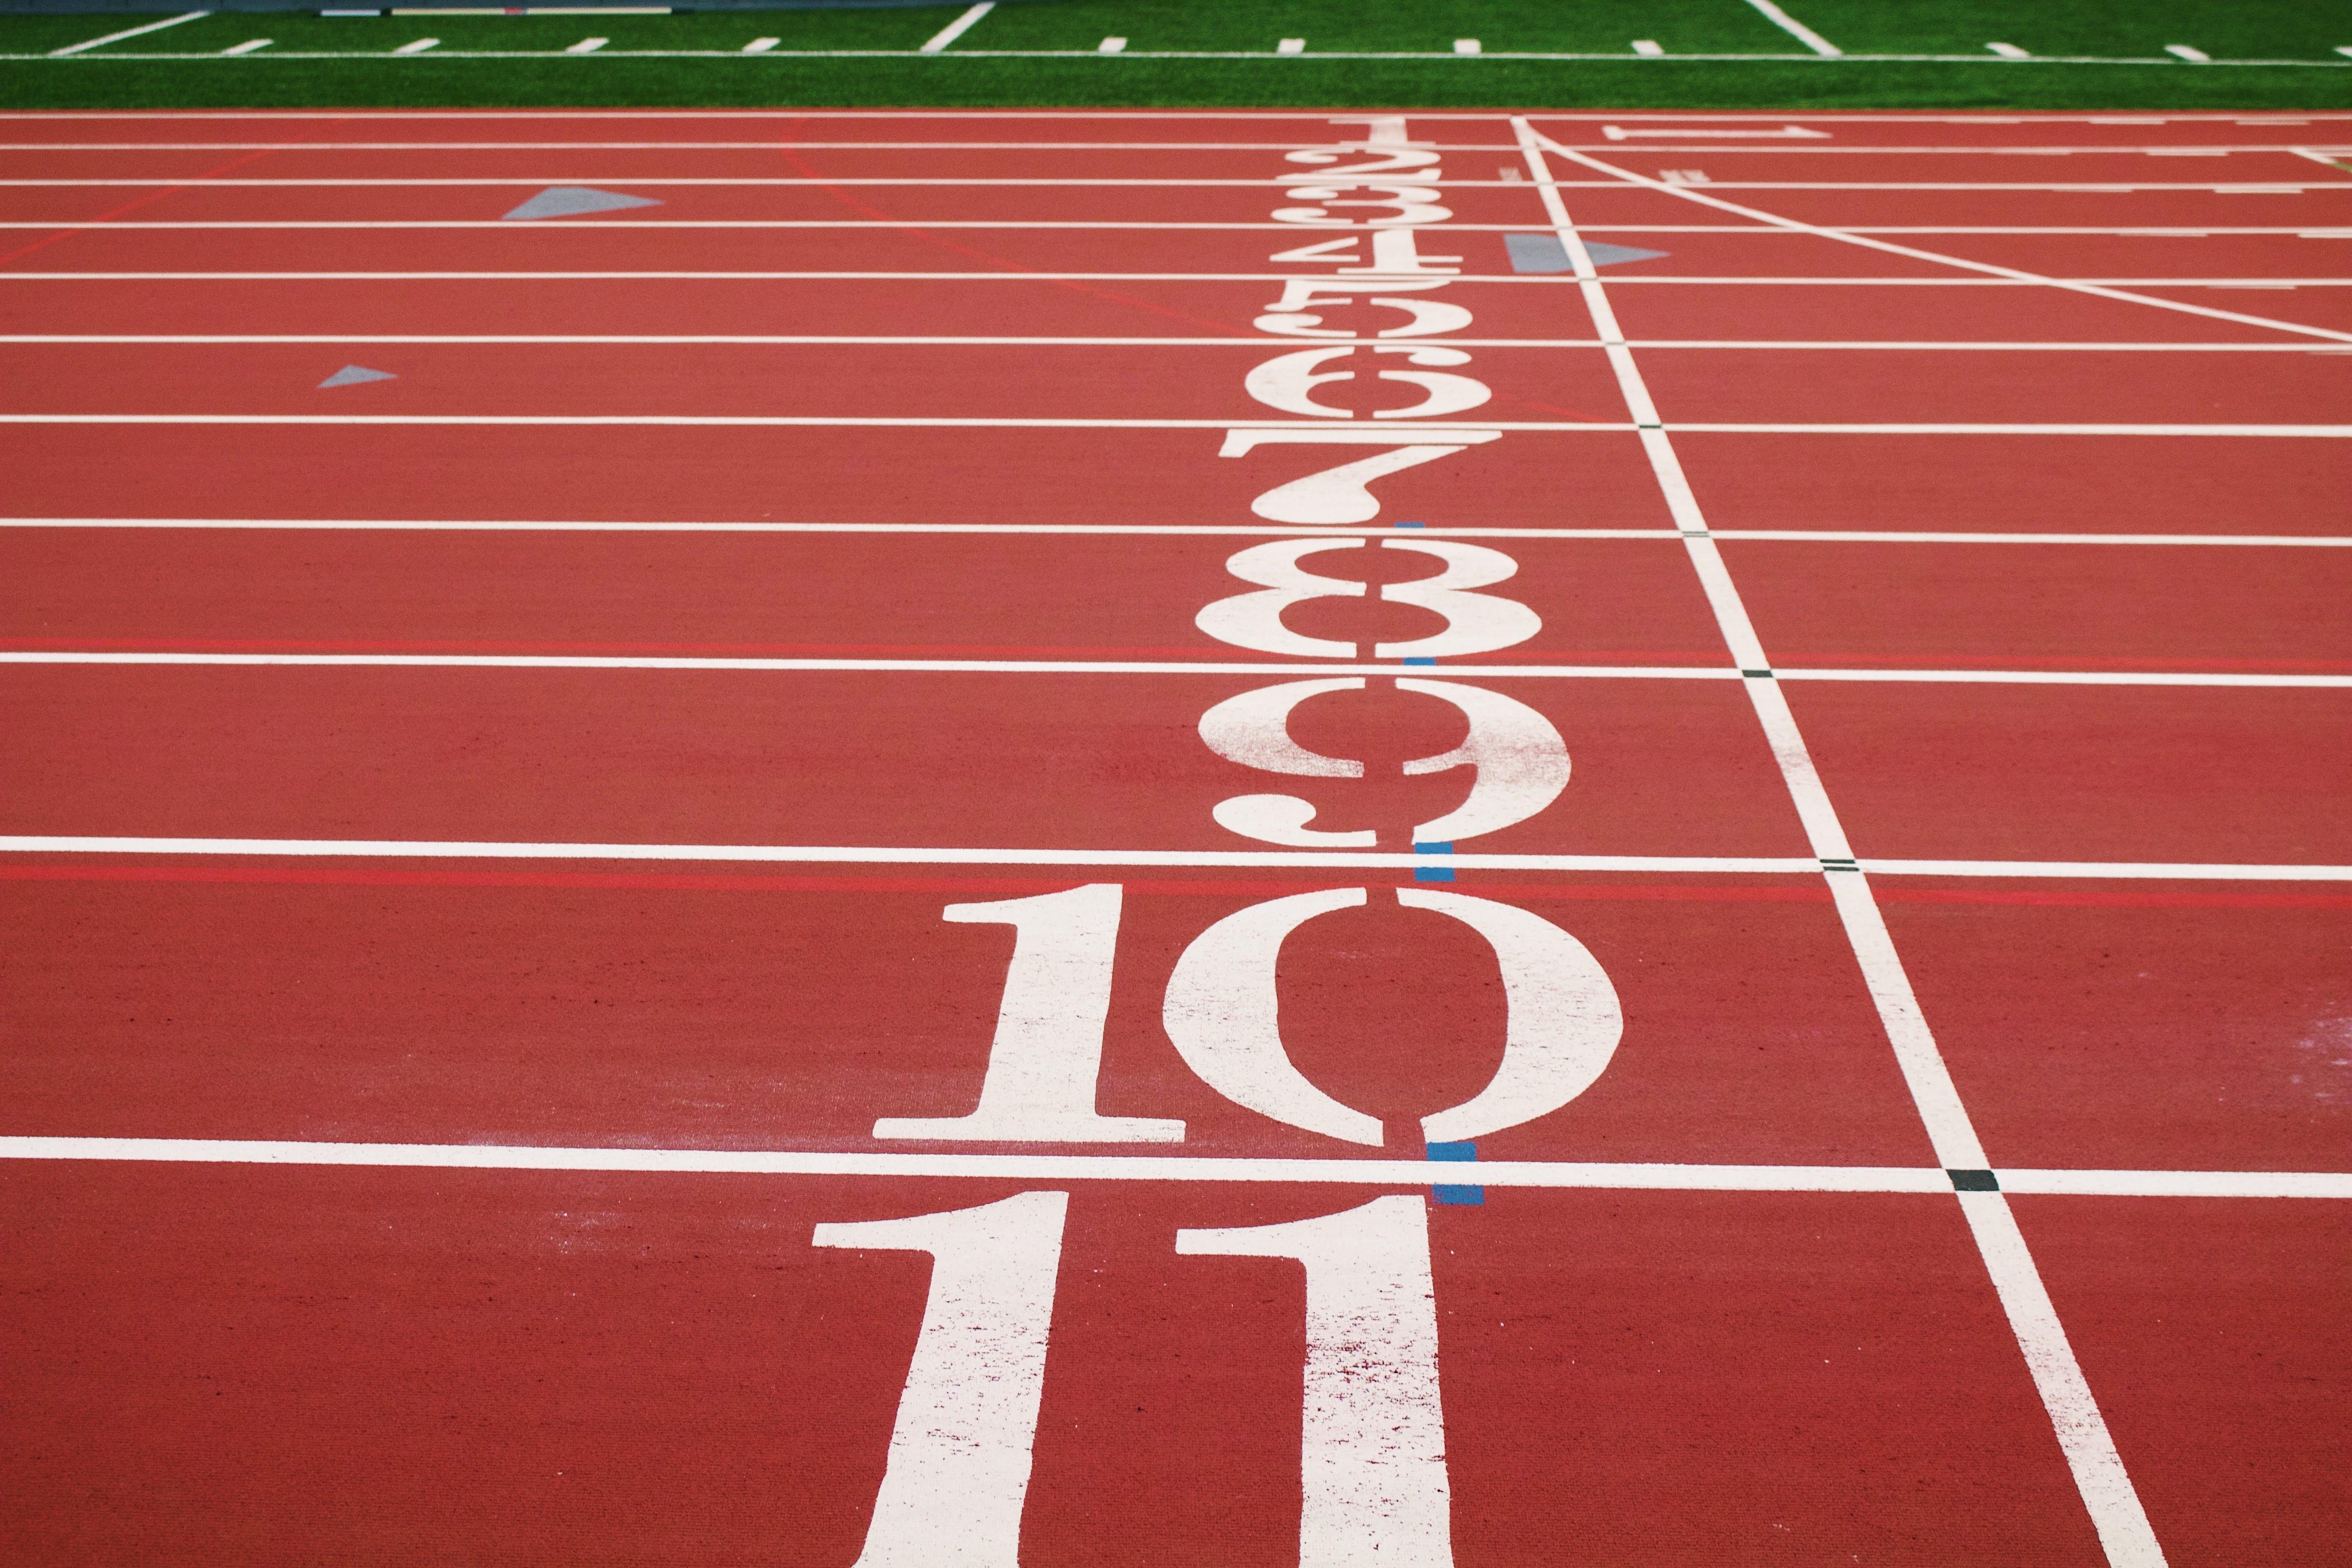 College Track Athlete Settles Assault Case for Almost $1 Million